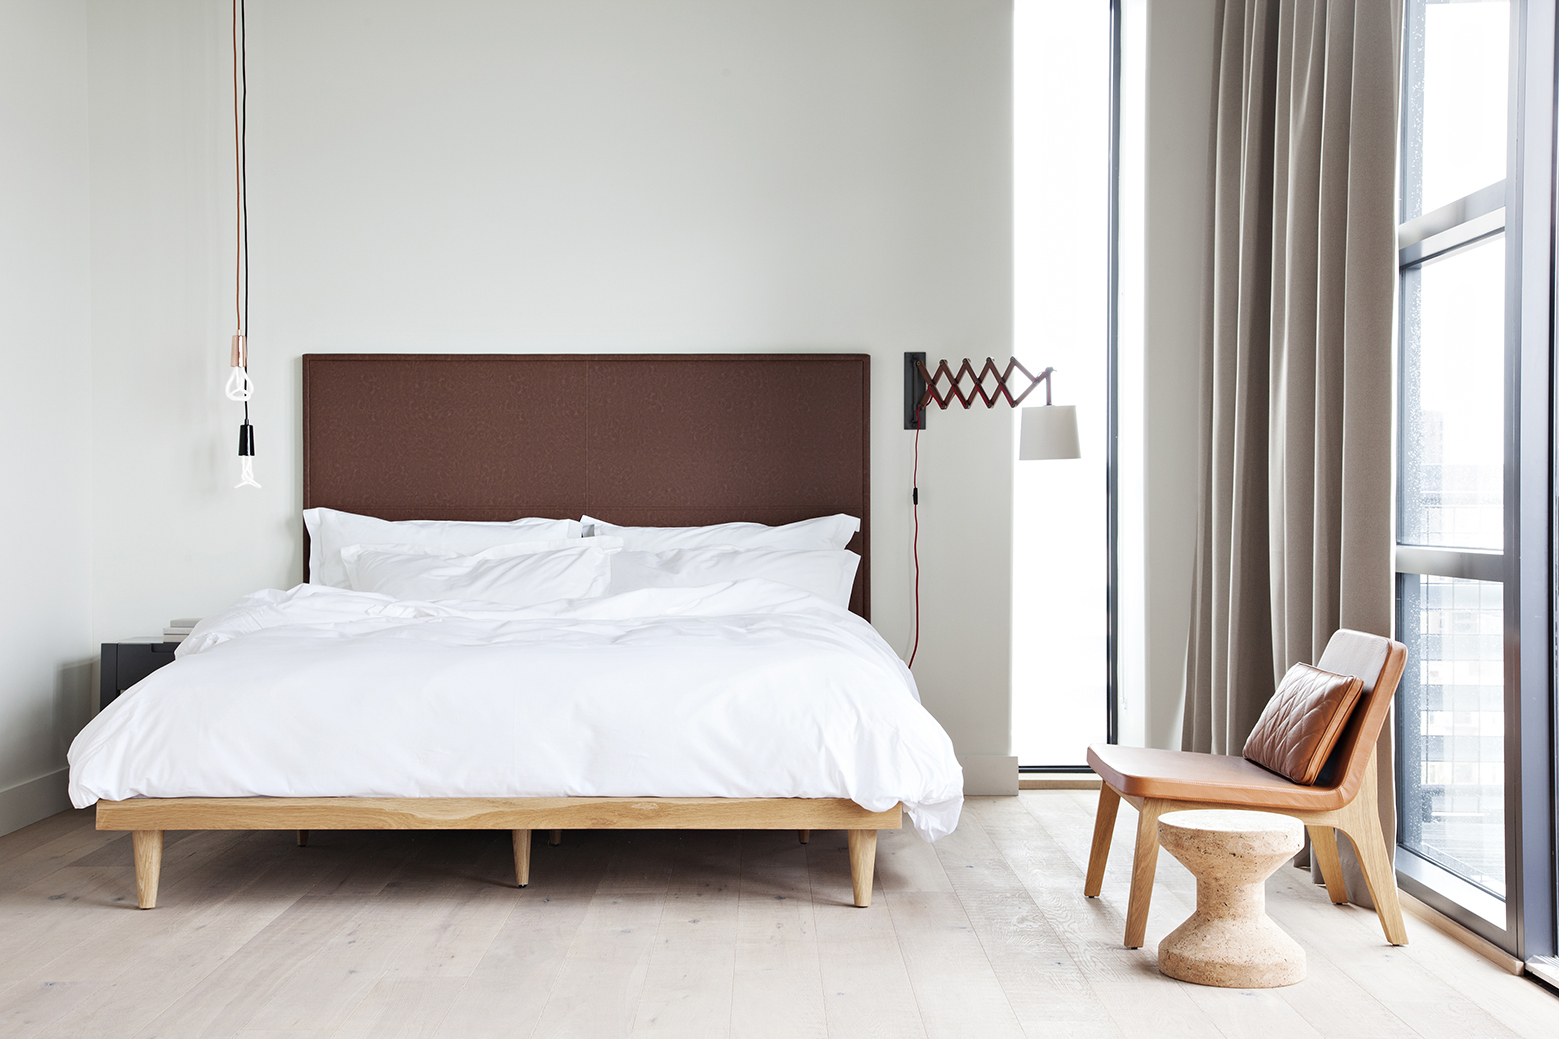 Gallery of the boro hotel grzywinski pons 12 for Design boutique hotels copenhagen